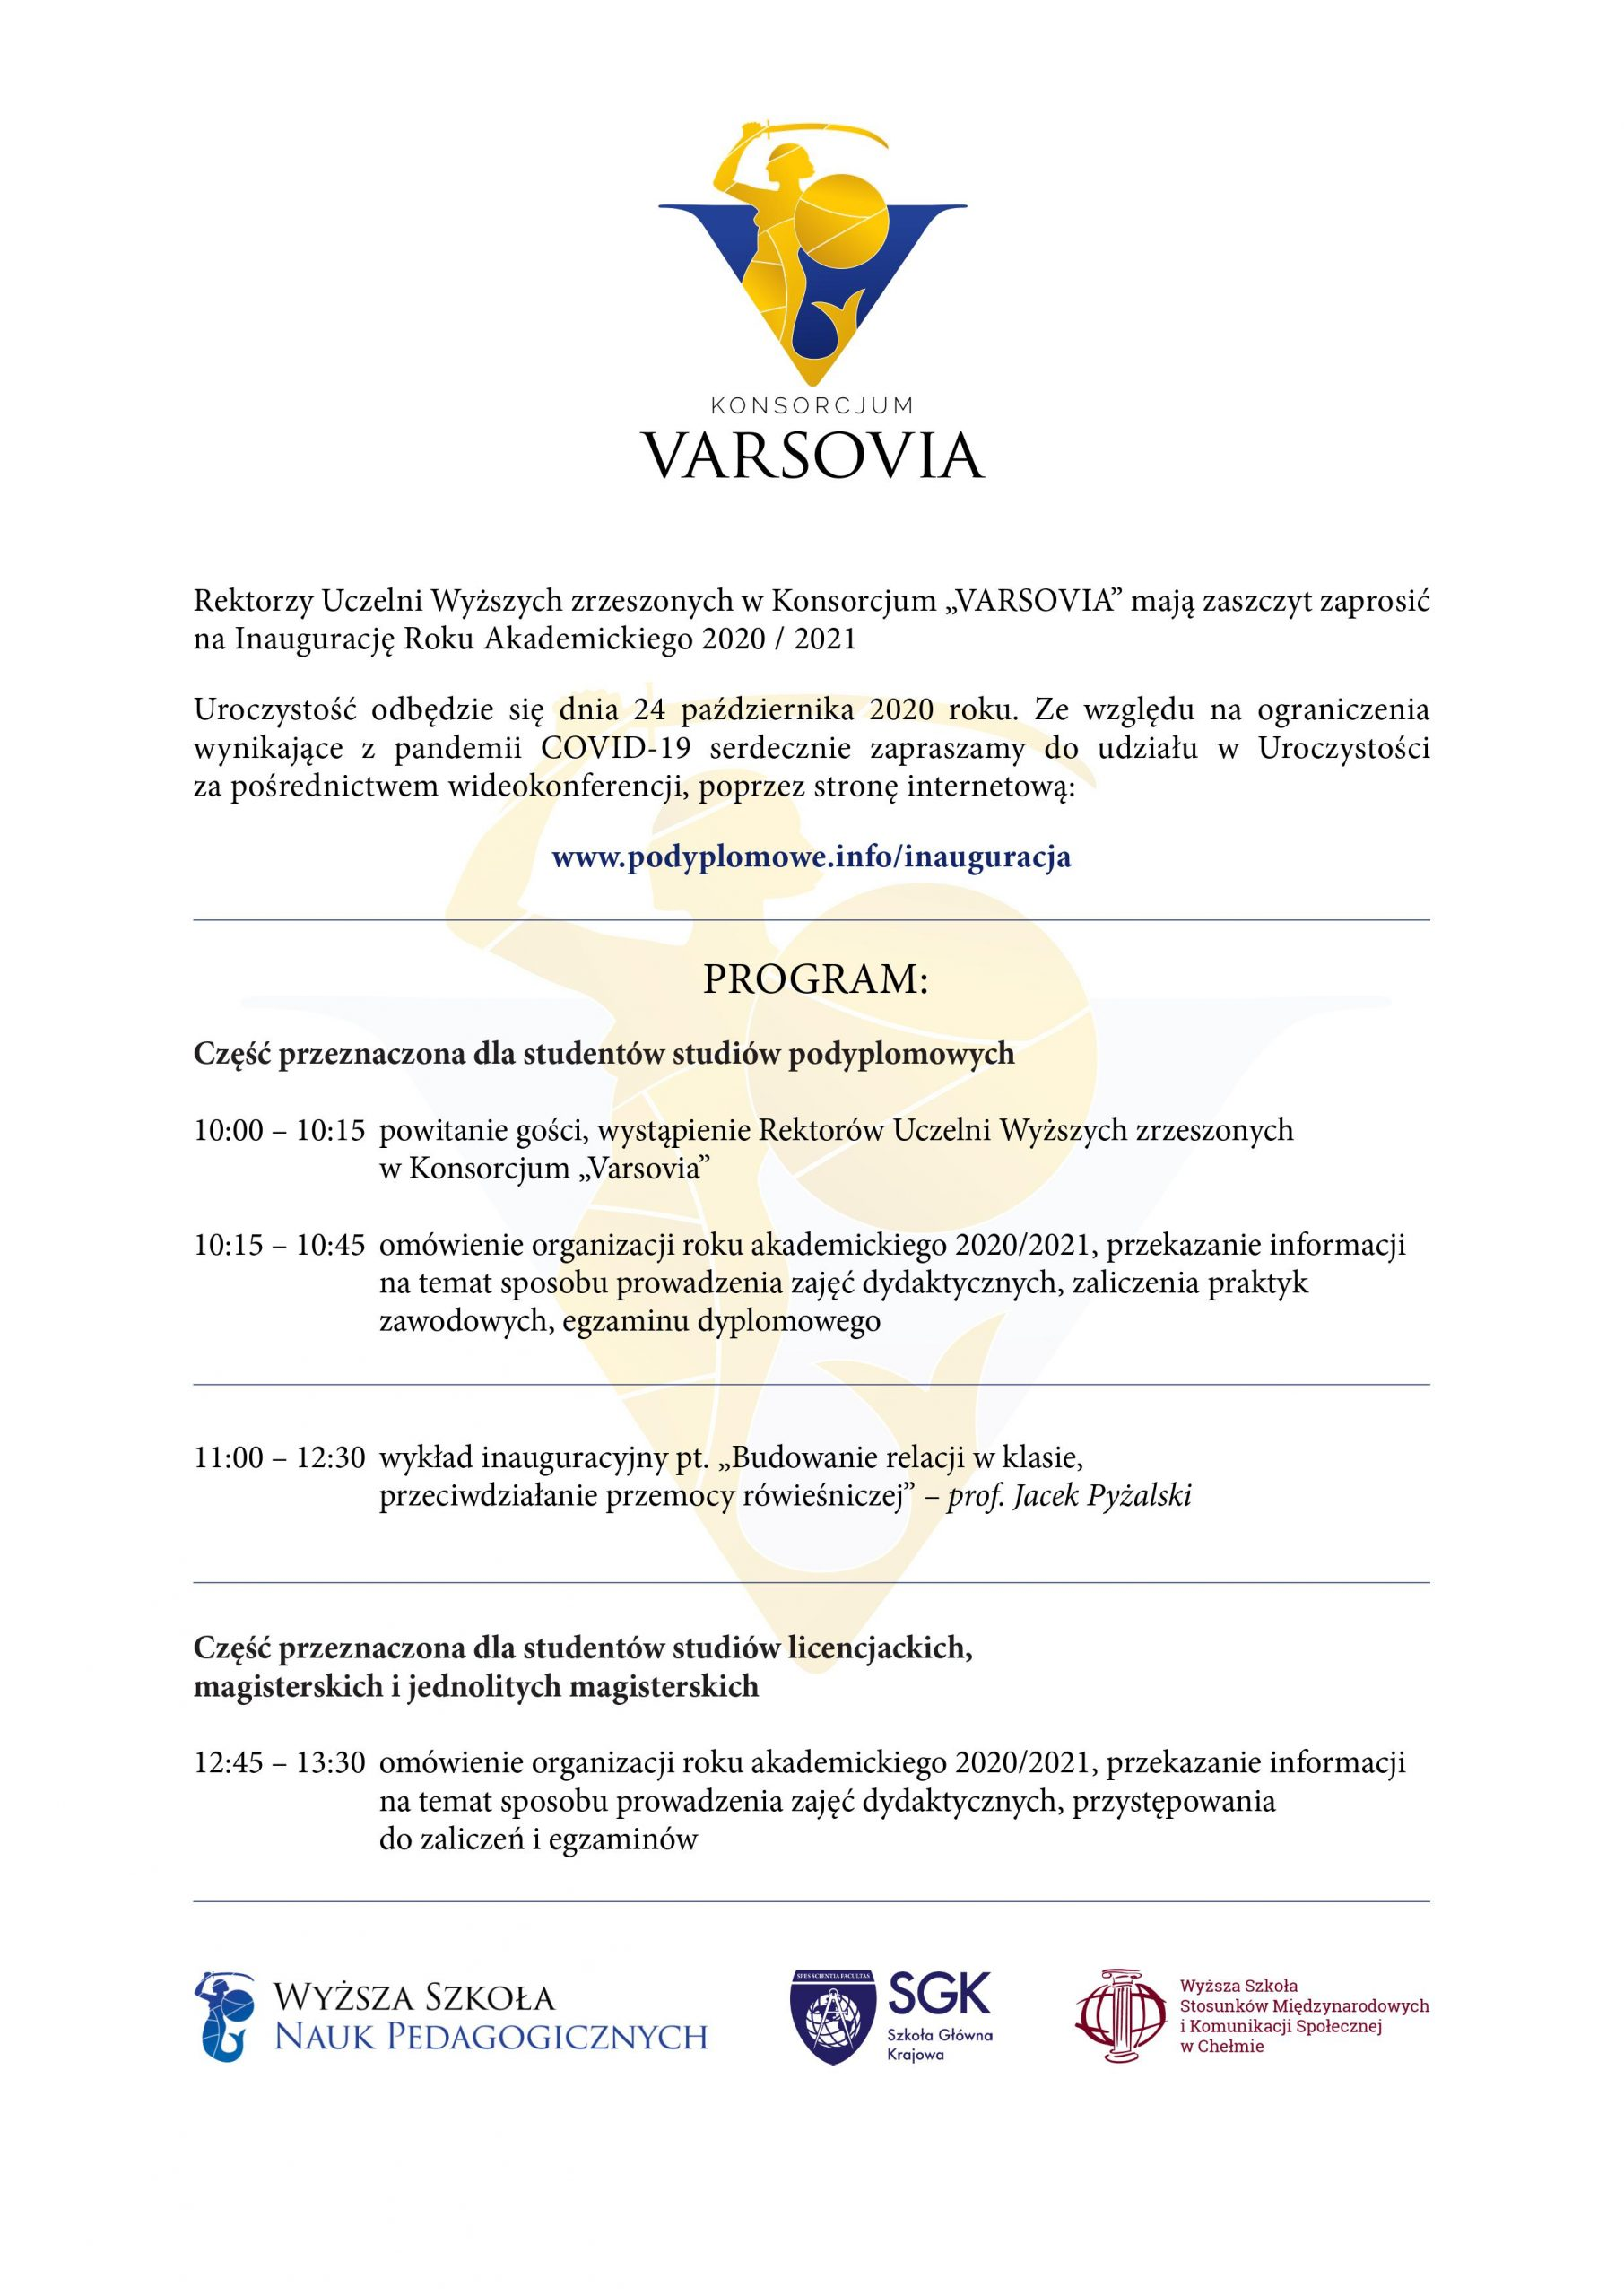 Inauguracja Roku Akademickiego 2020/ 2021